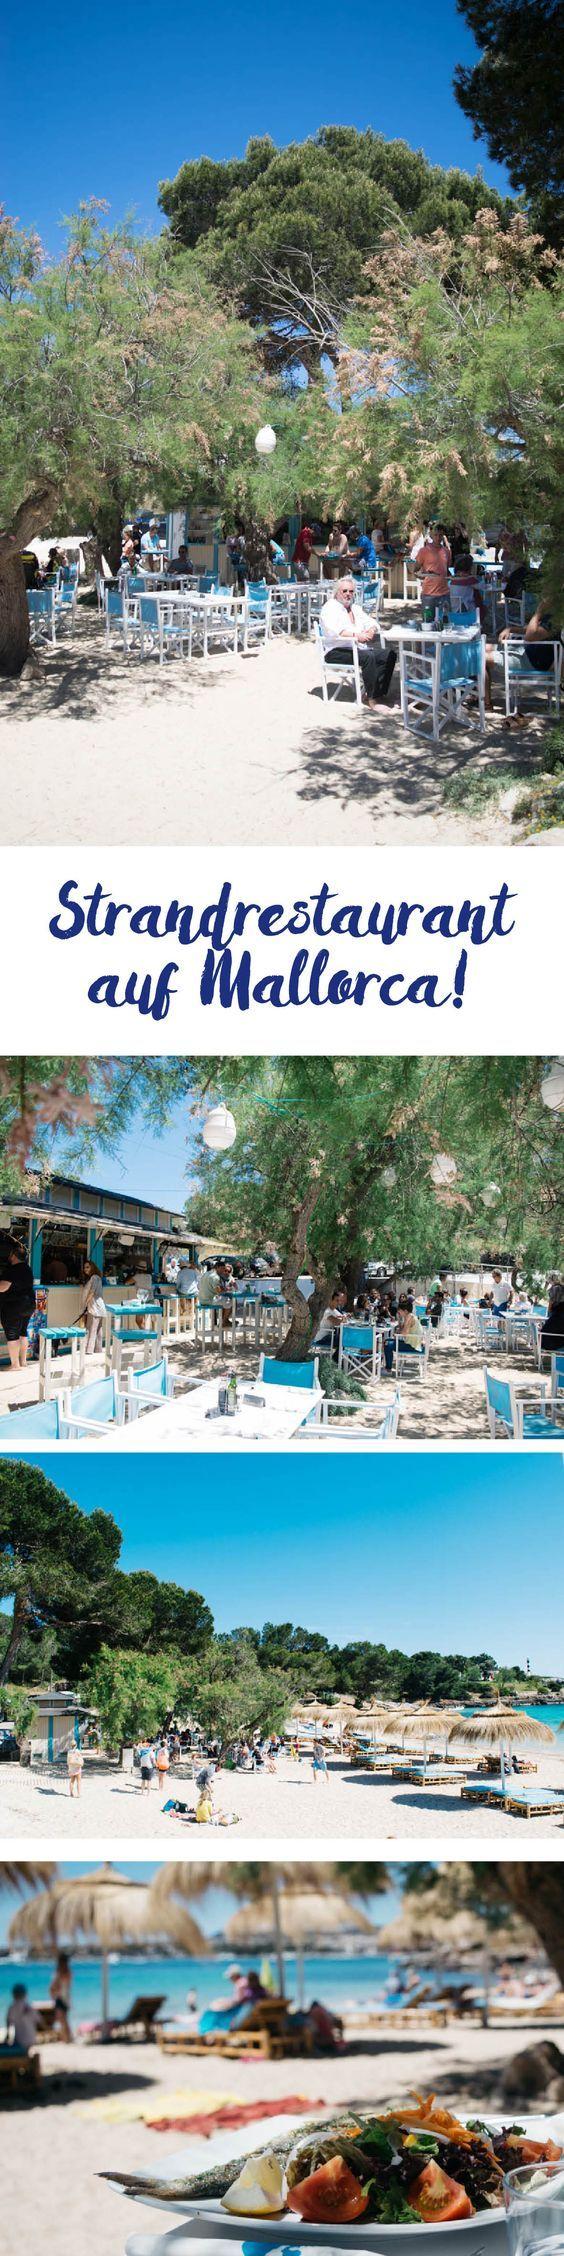 Leckeres Strandrestaurant auf Mallorca in Porto Colom